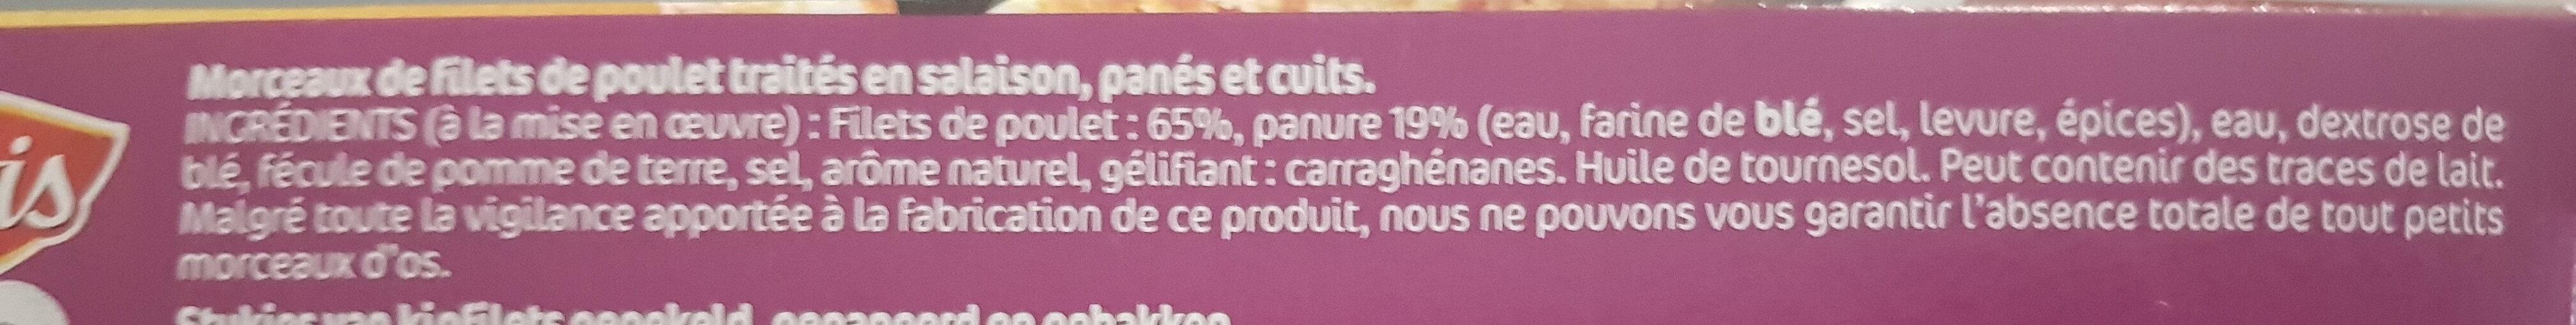 Crousty chicken - Ingredients - fr